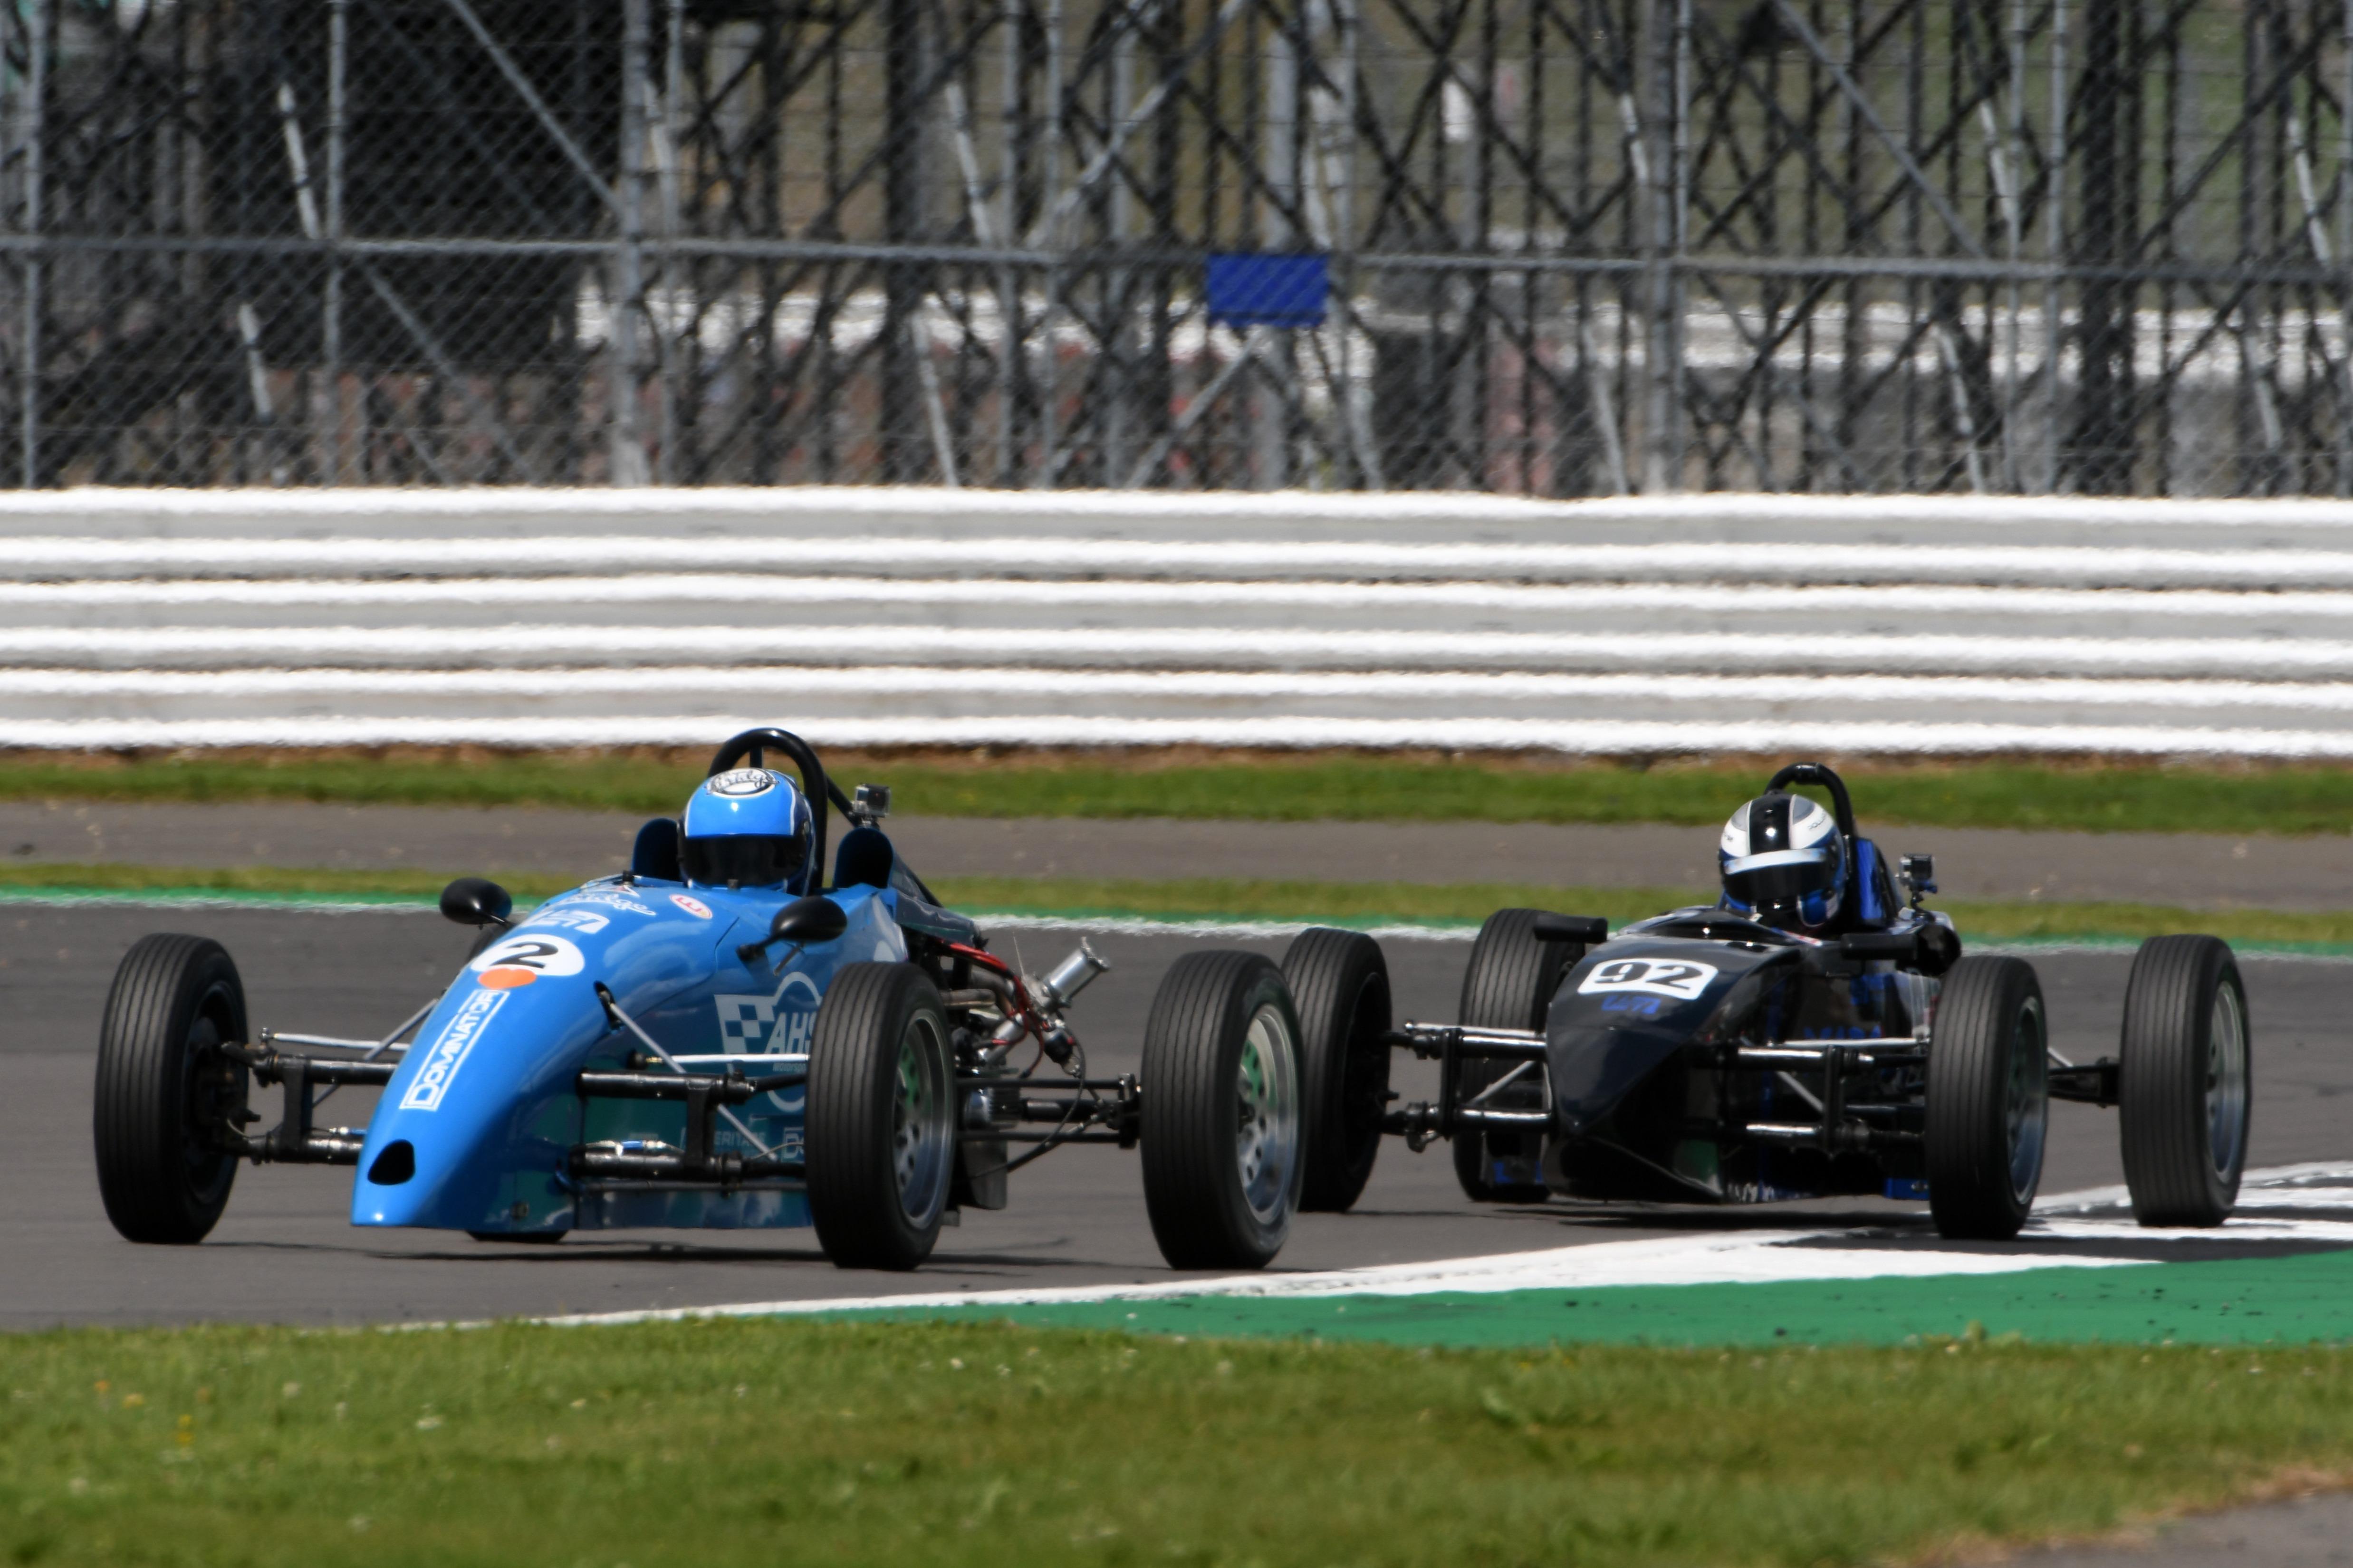 Danny Hands (AHS Dominator Mk2), Formula Vee, Silverstone 2021